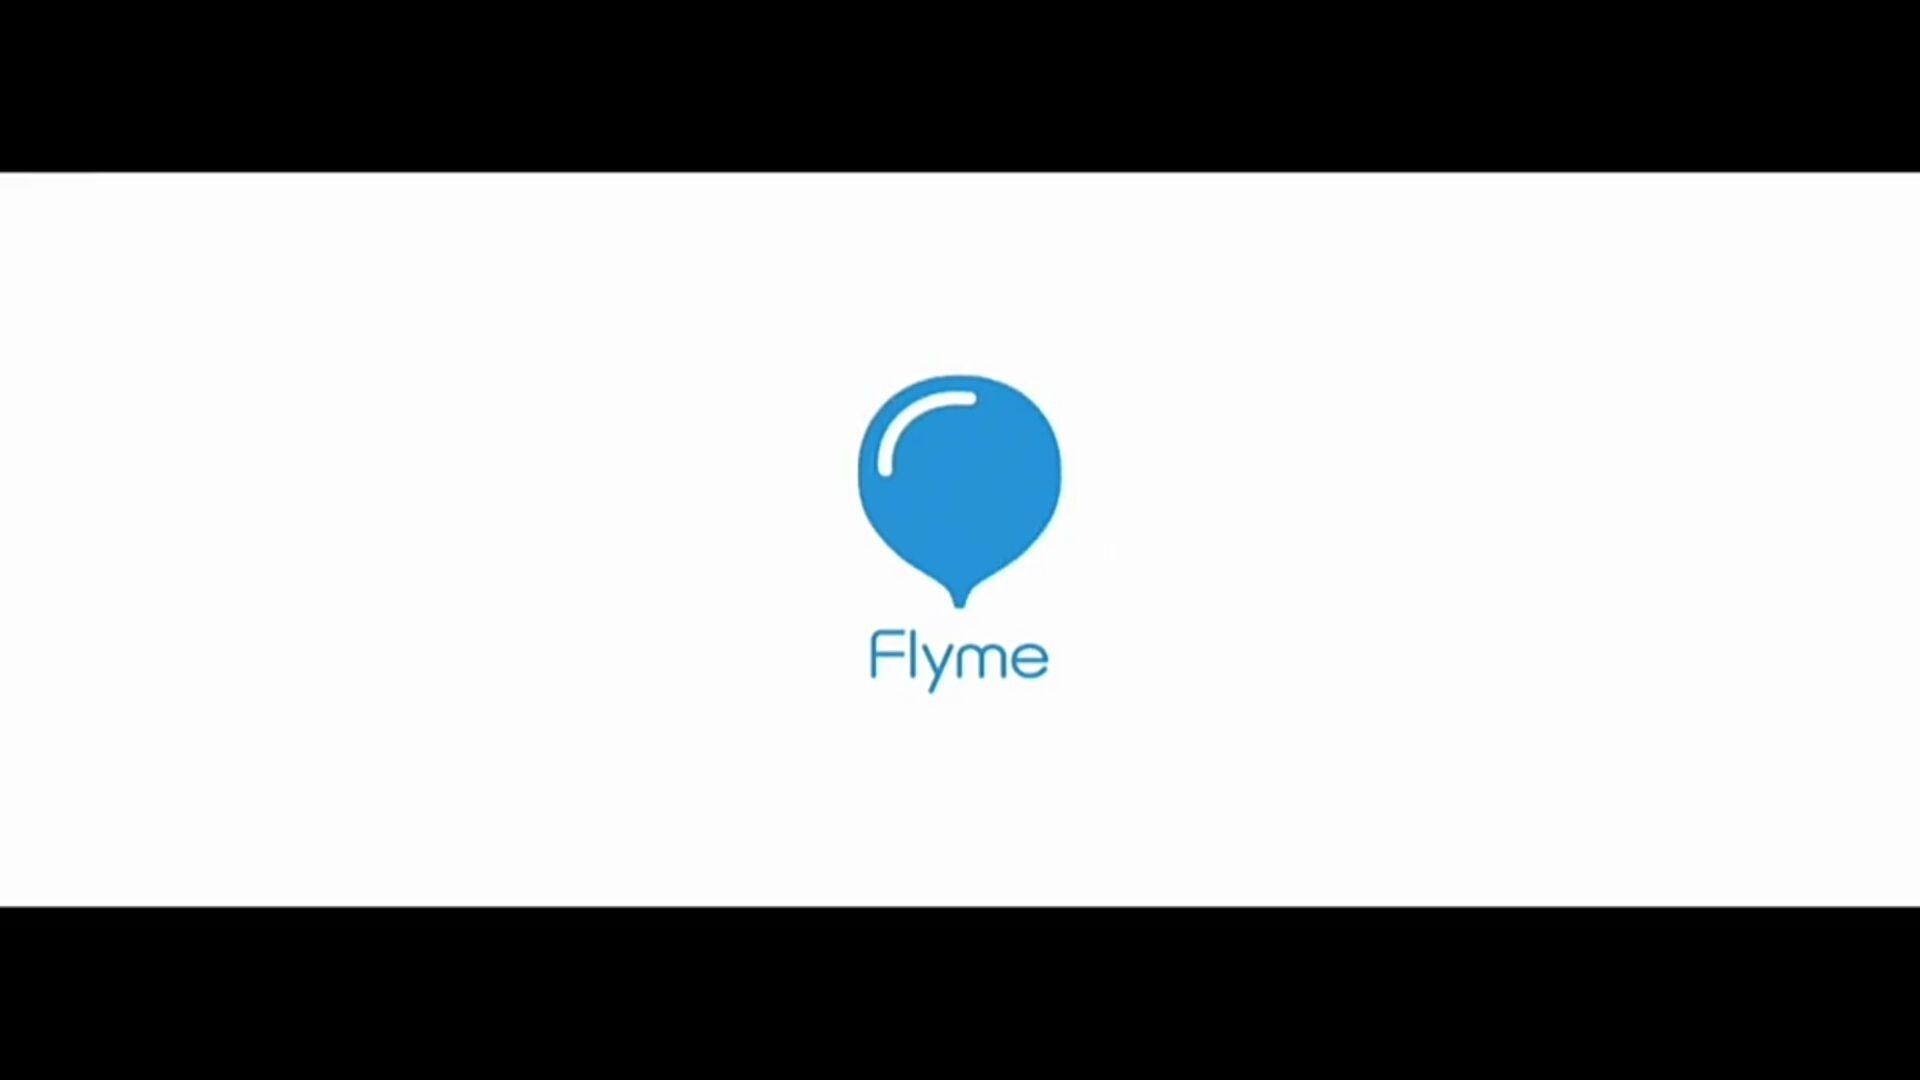 Meizu MX5にFlyme OS 5.0が提供開始。新FlymeOS「Flyme OS 5.0」の紹介